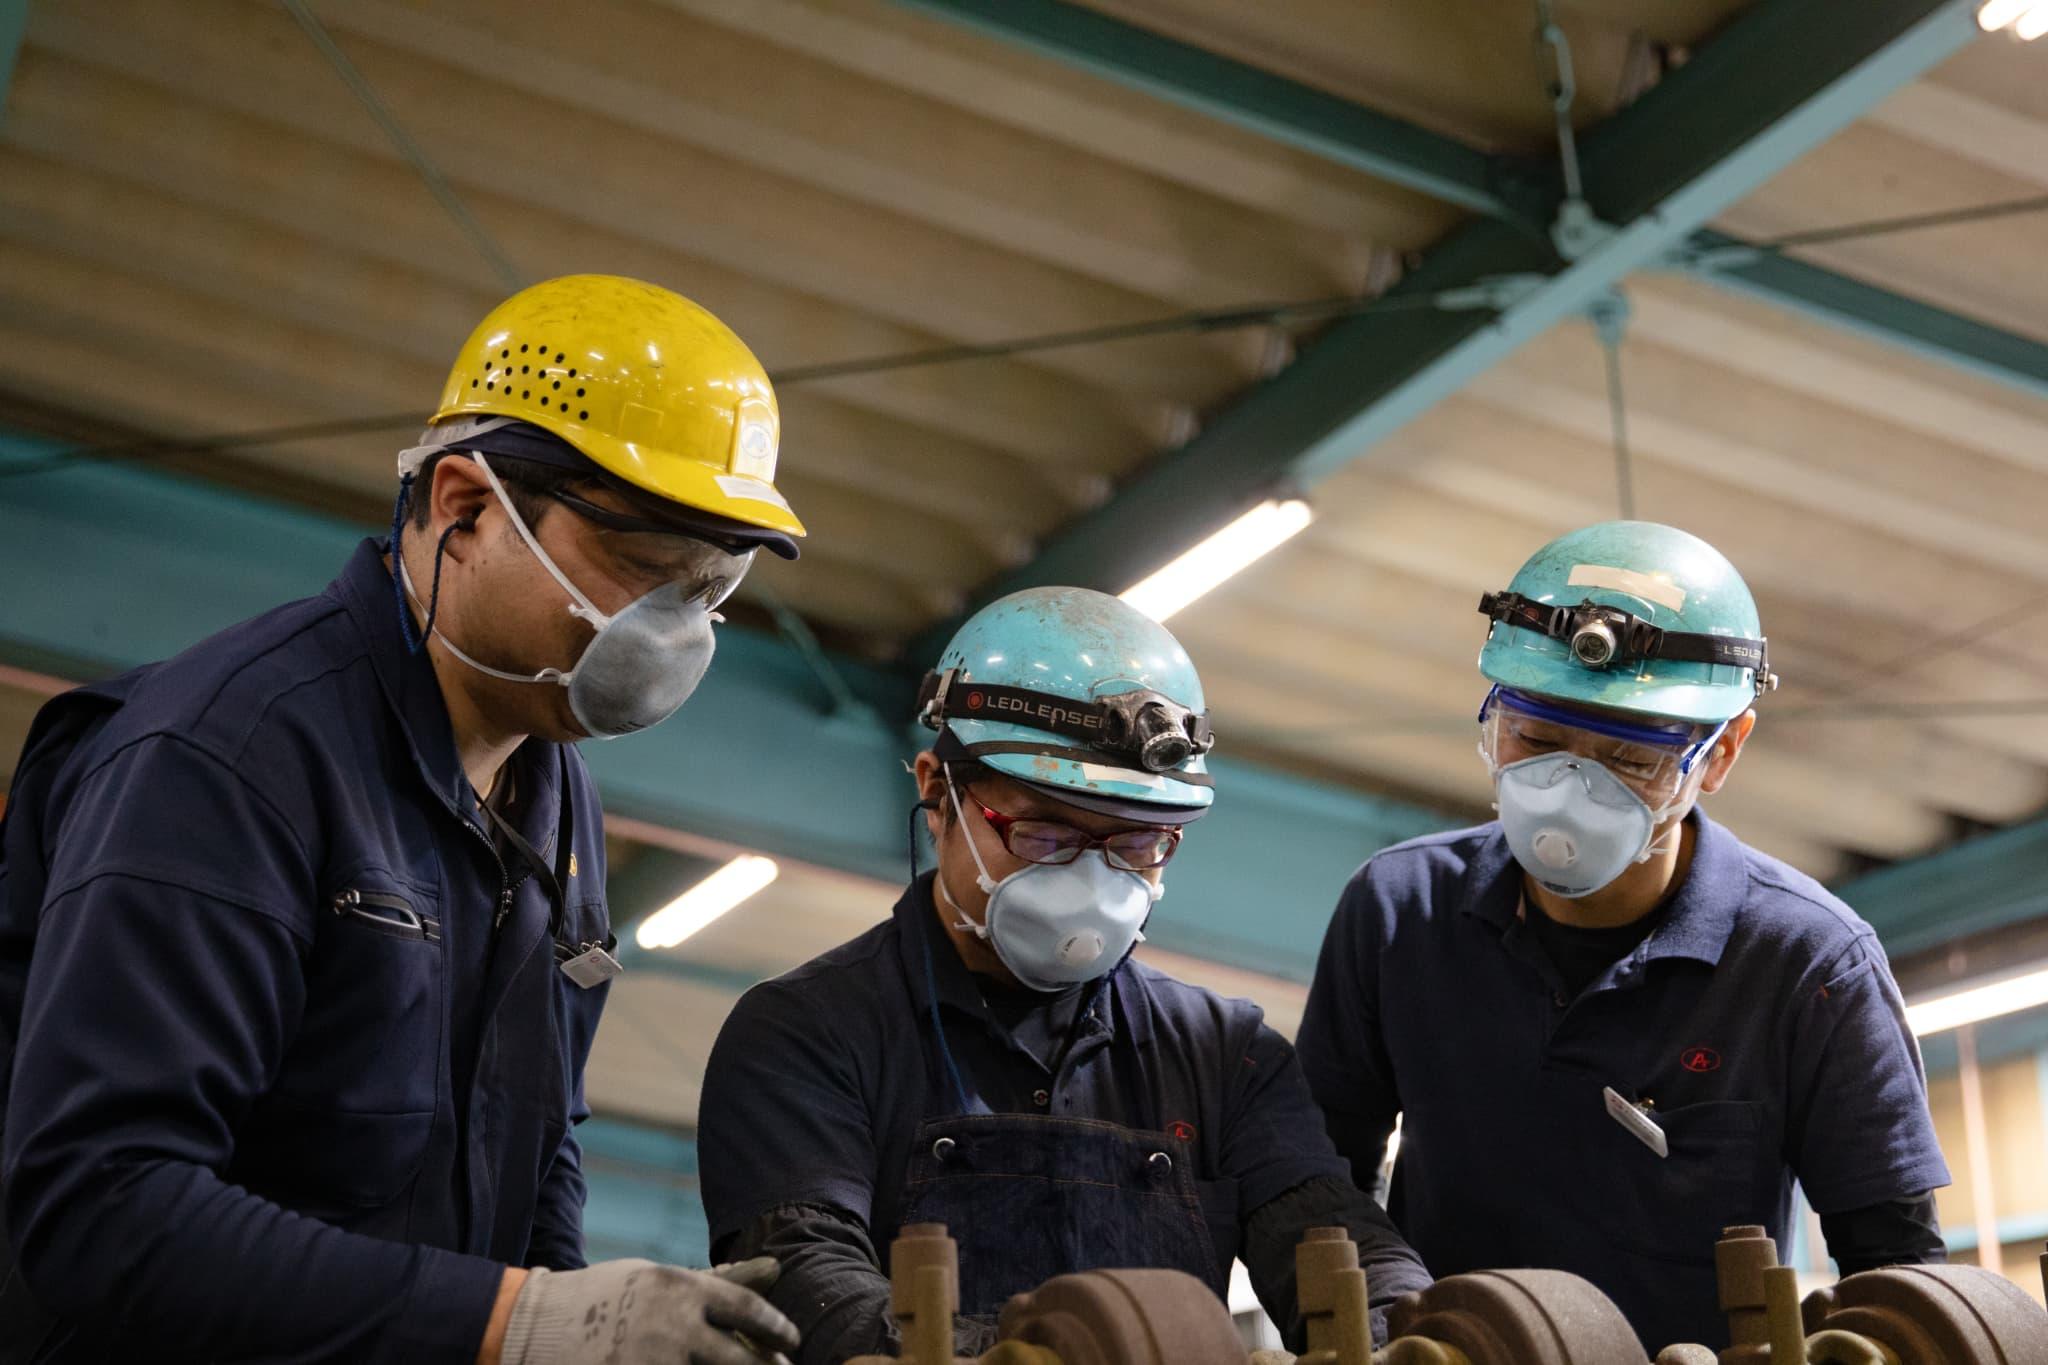 Mitsu Plant, Precision Machinery No. 2 Plant